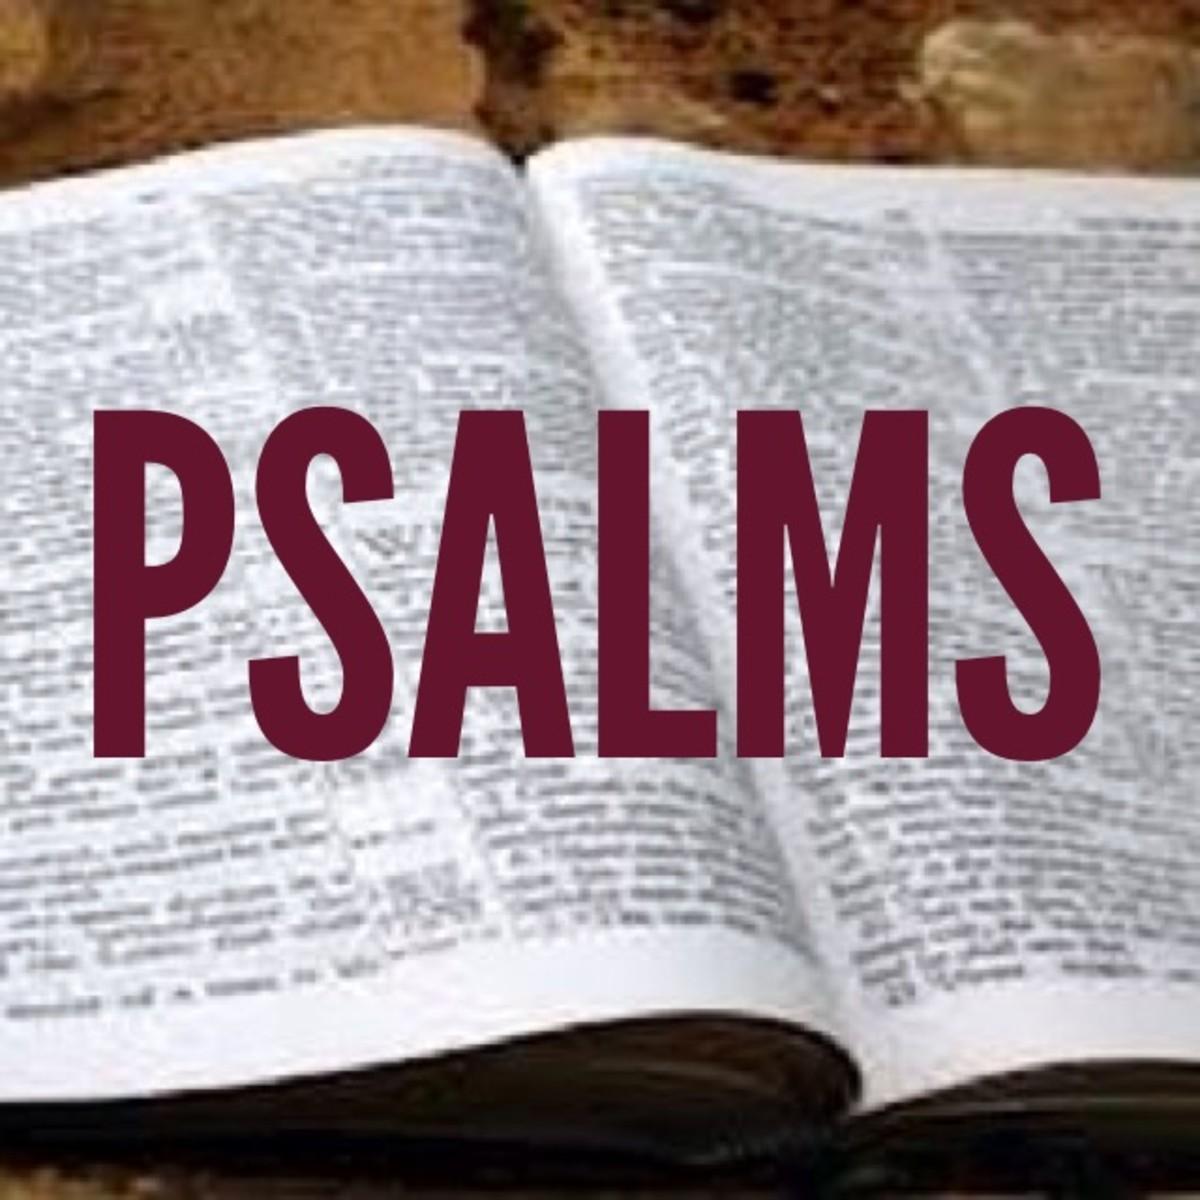 Psalms vs. Proverbs